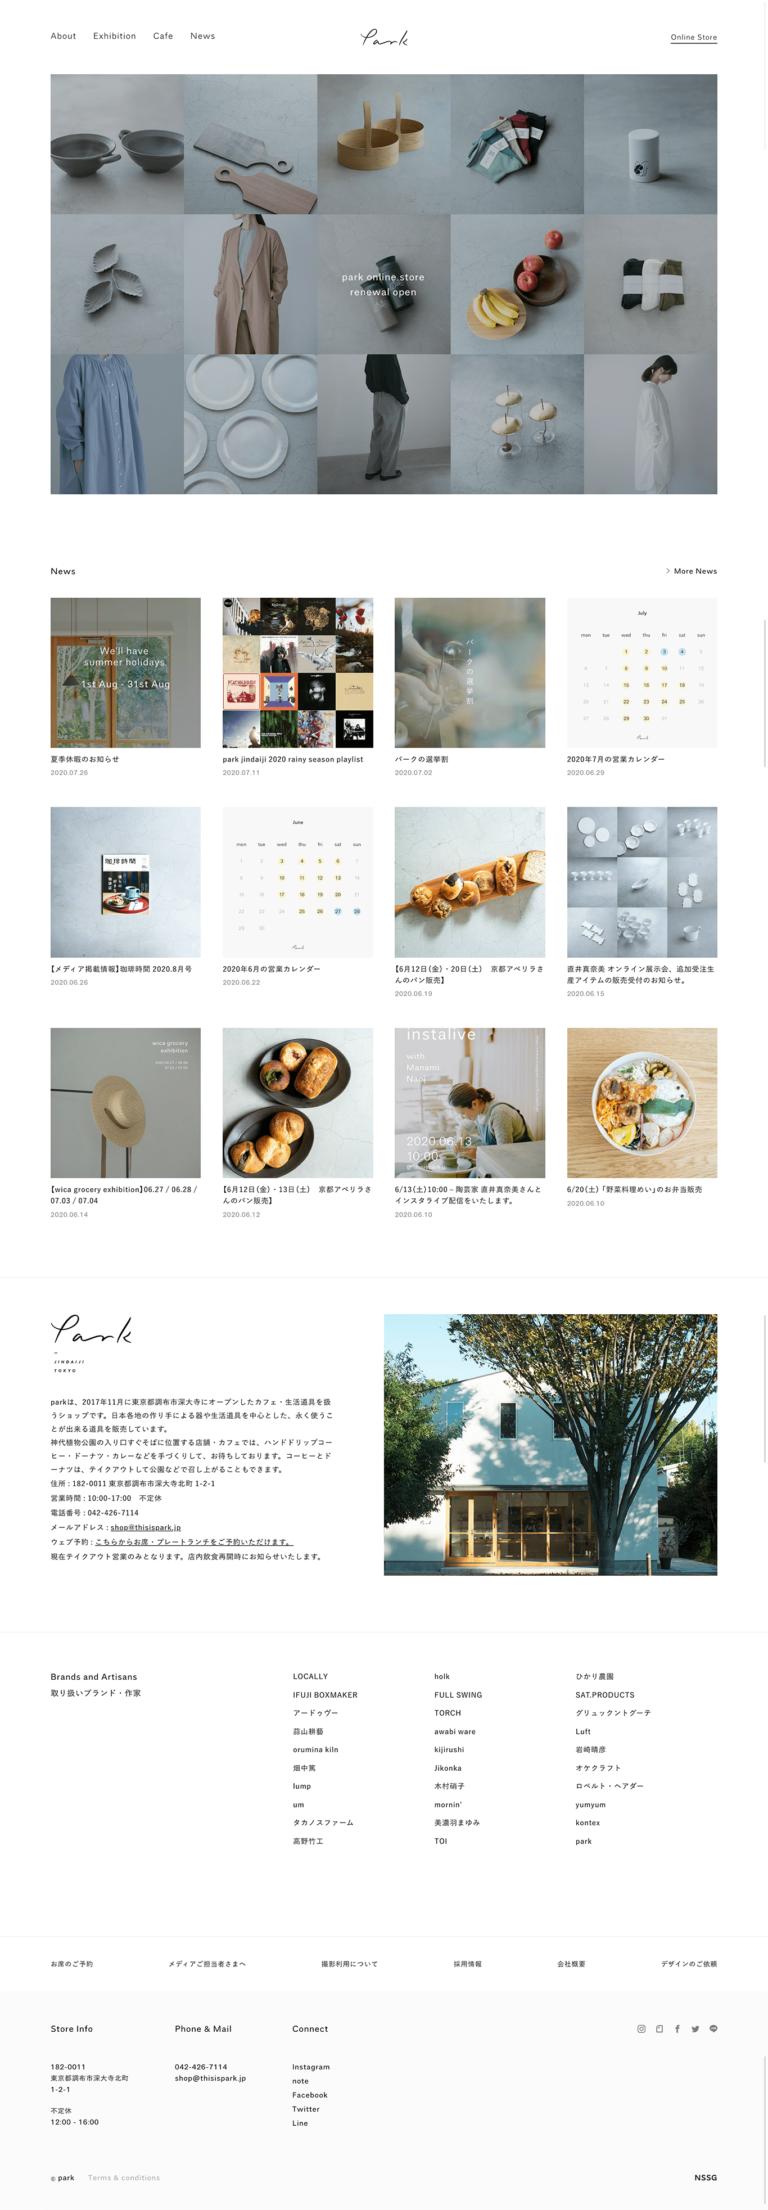 park | 調布 深大寺の生活道具・うつわ・ドーナツ・カフェ・オンラインストア